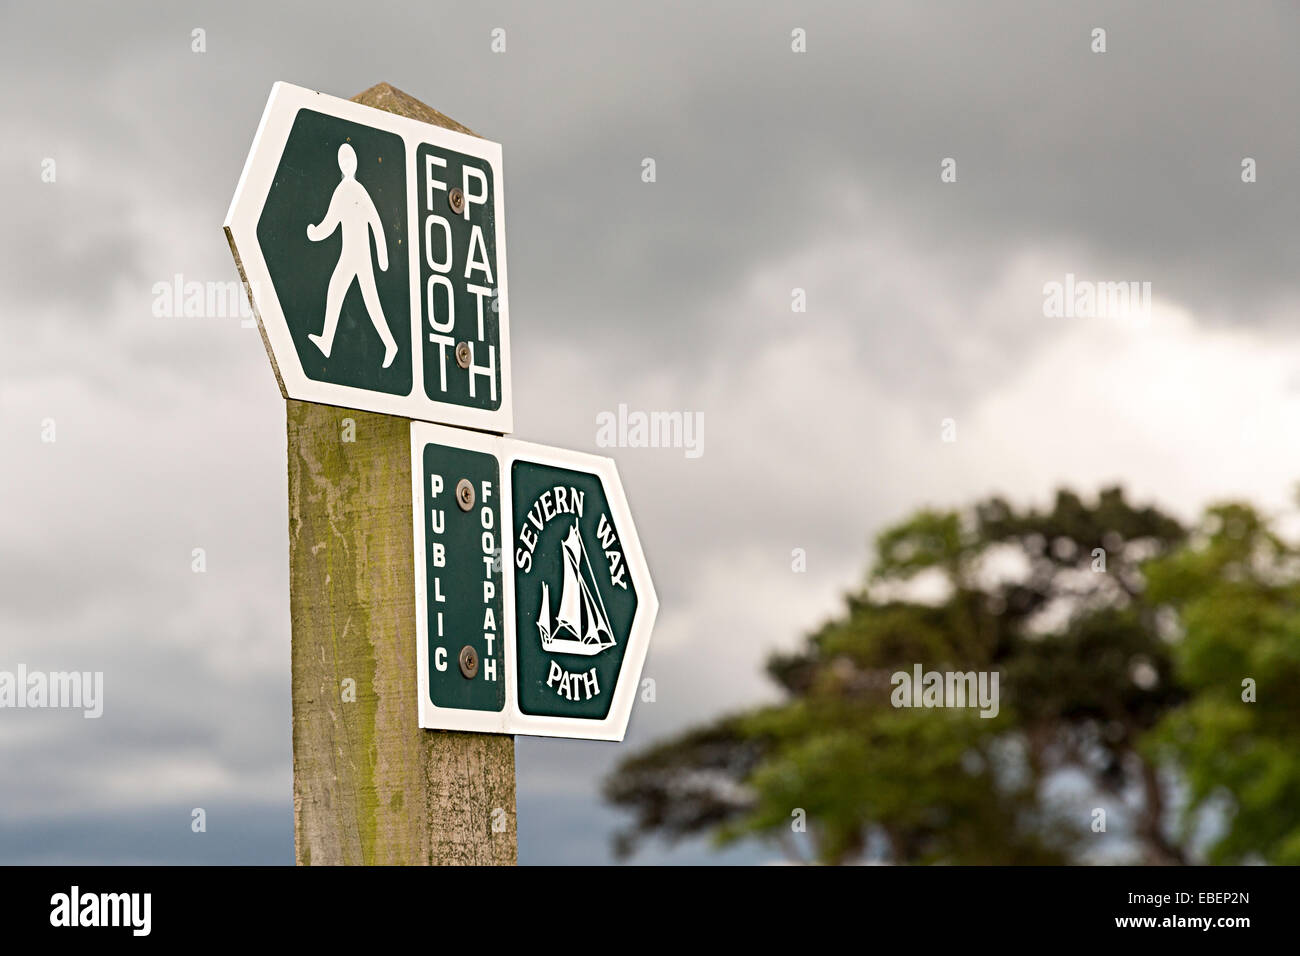 Severn Way footpath sign, River Severn at Salthouse, England, UK - Stock Image